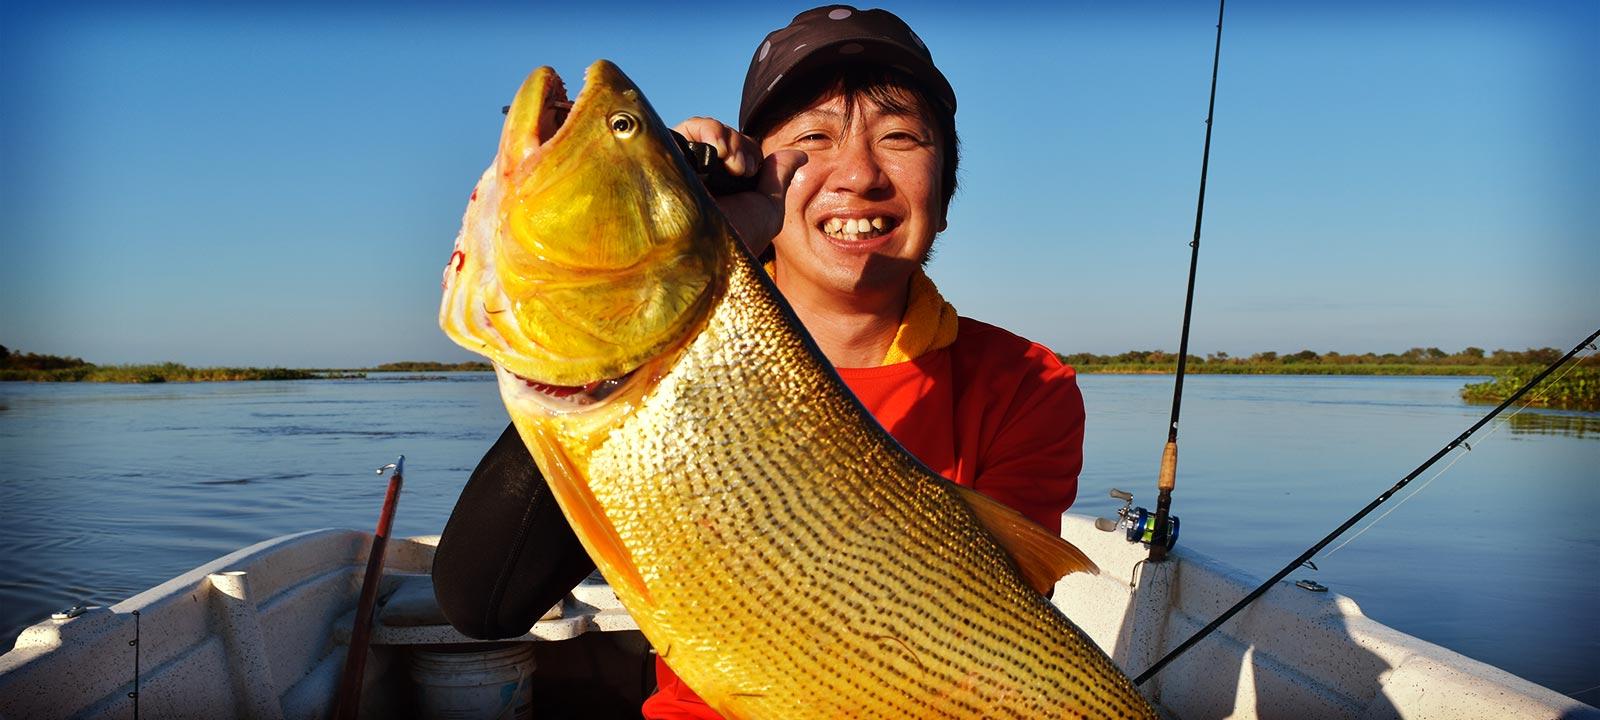 Marlin fishing charters in ecuador and the galapagos for Fishing in ecuador